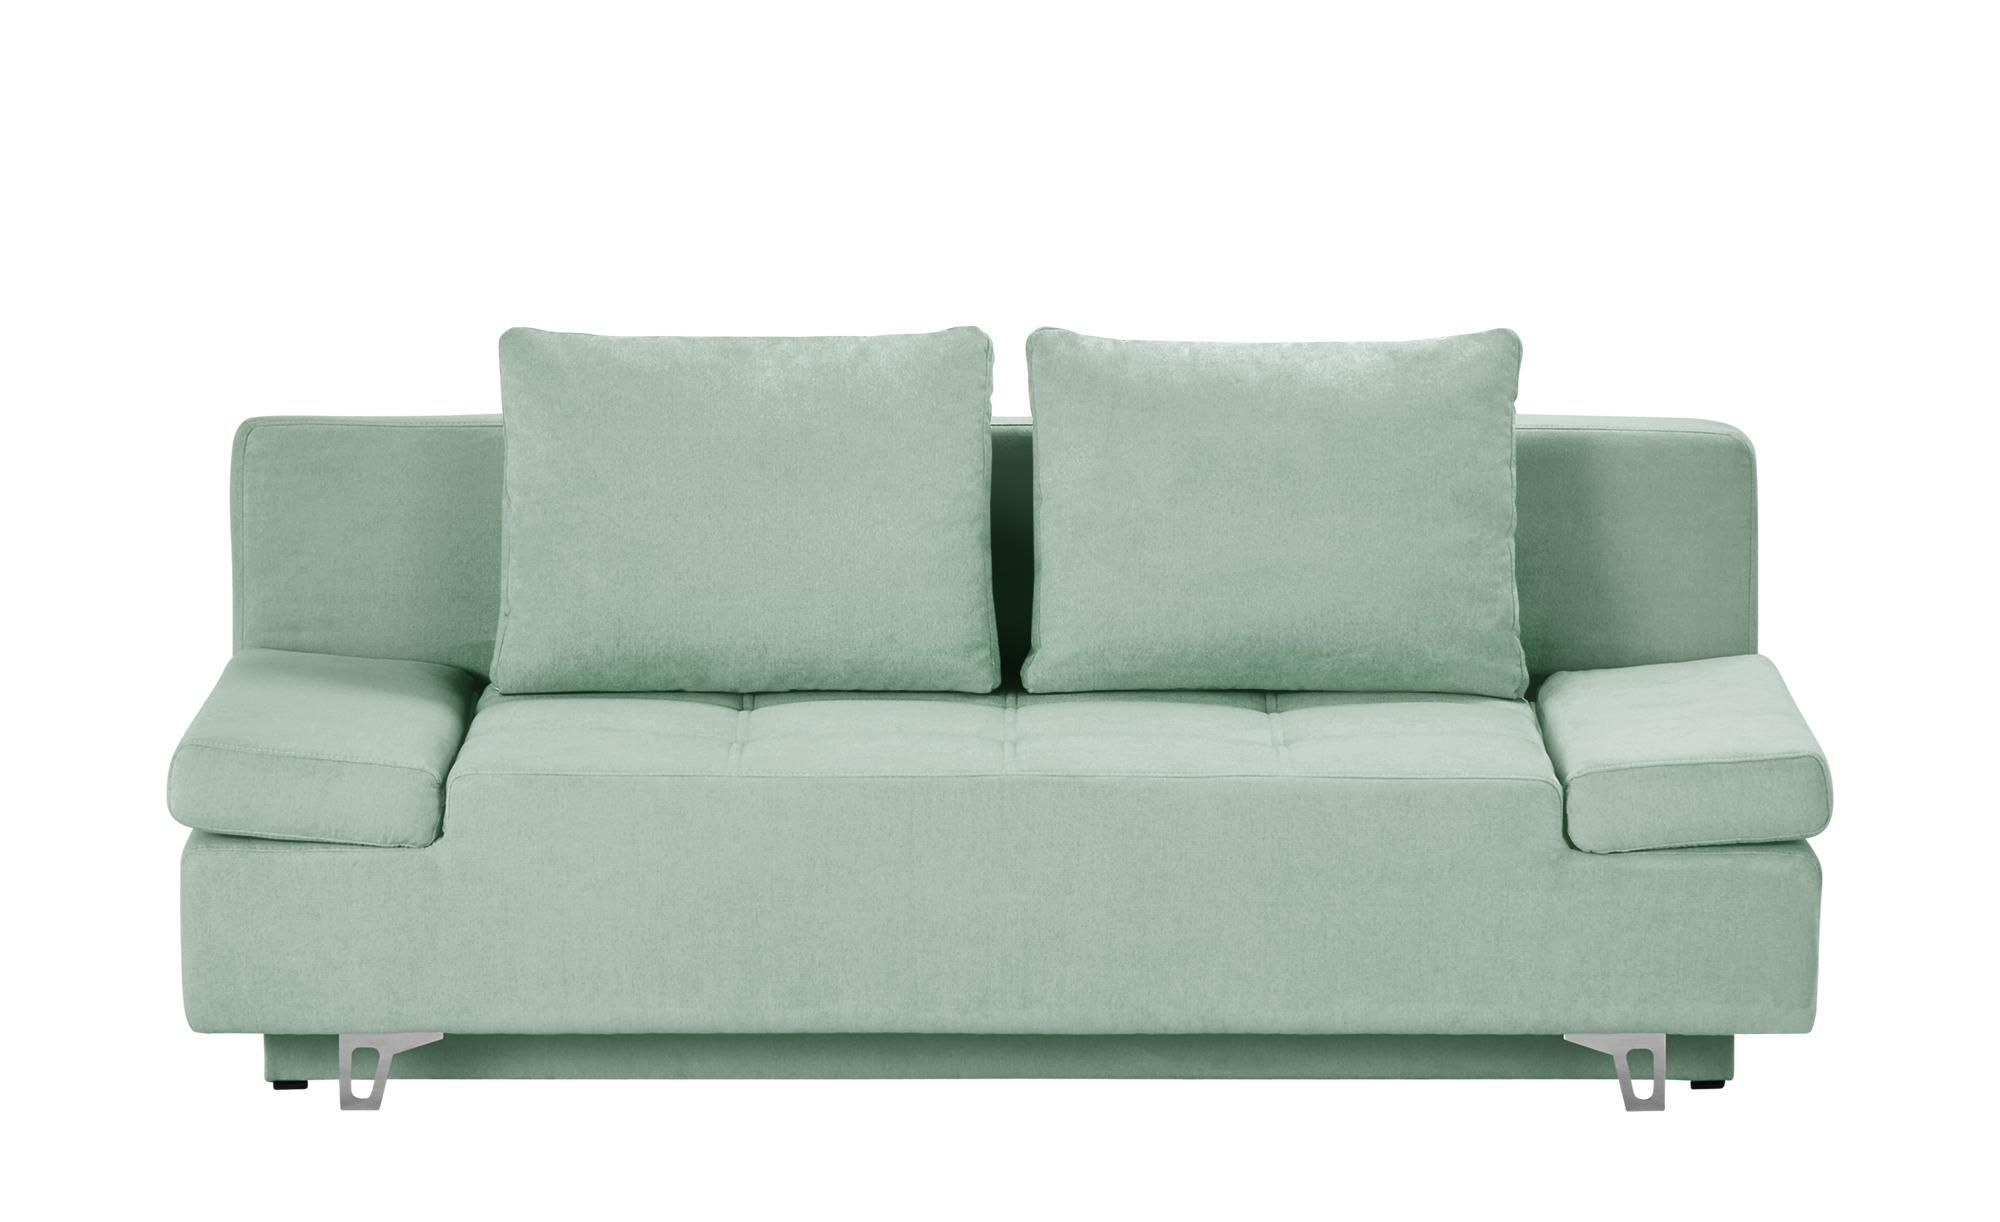 smart schlafsofa patriece breite 200 cm h he 90 cm. Black Bedroom Furniture Sets. Home Design Ideas